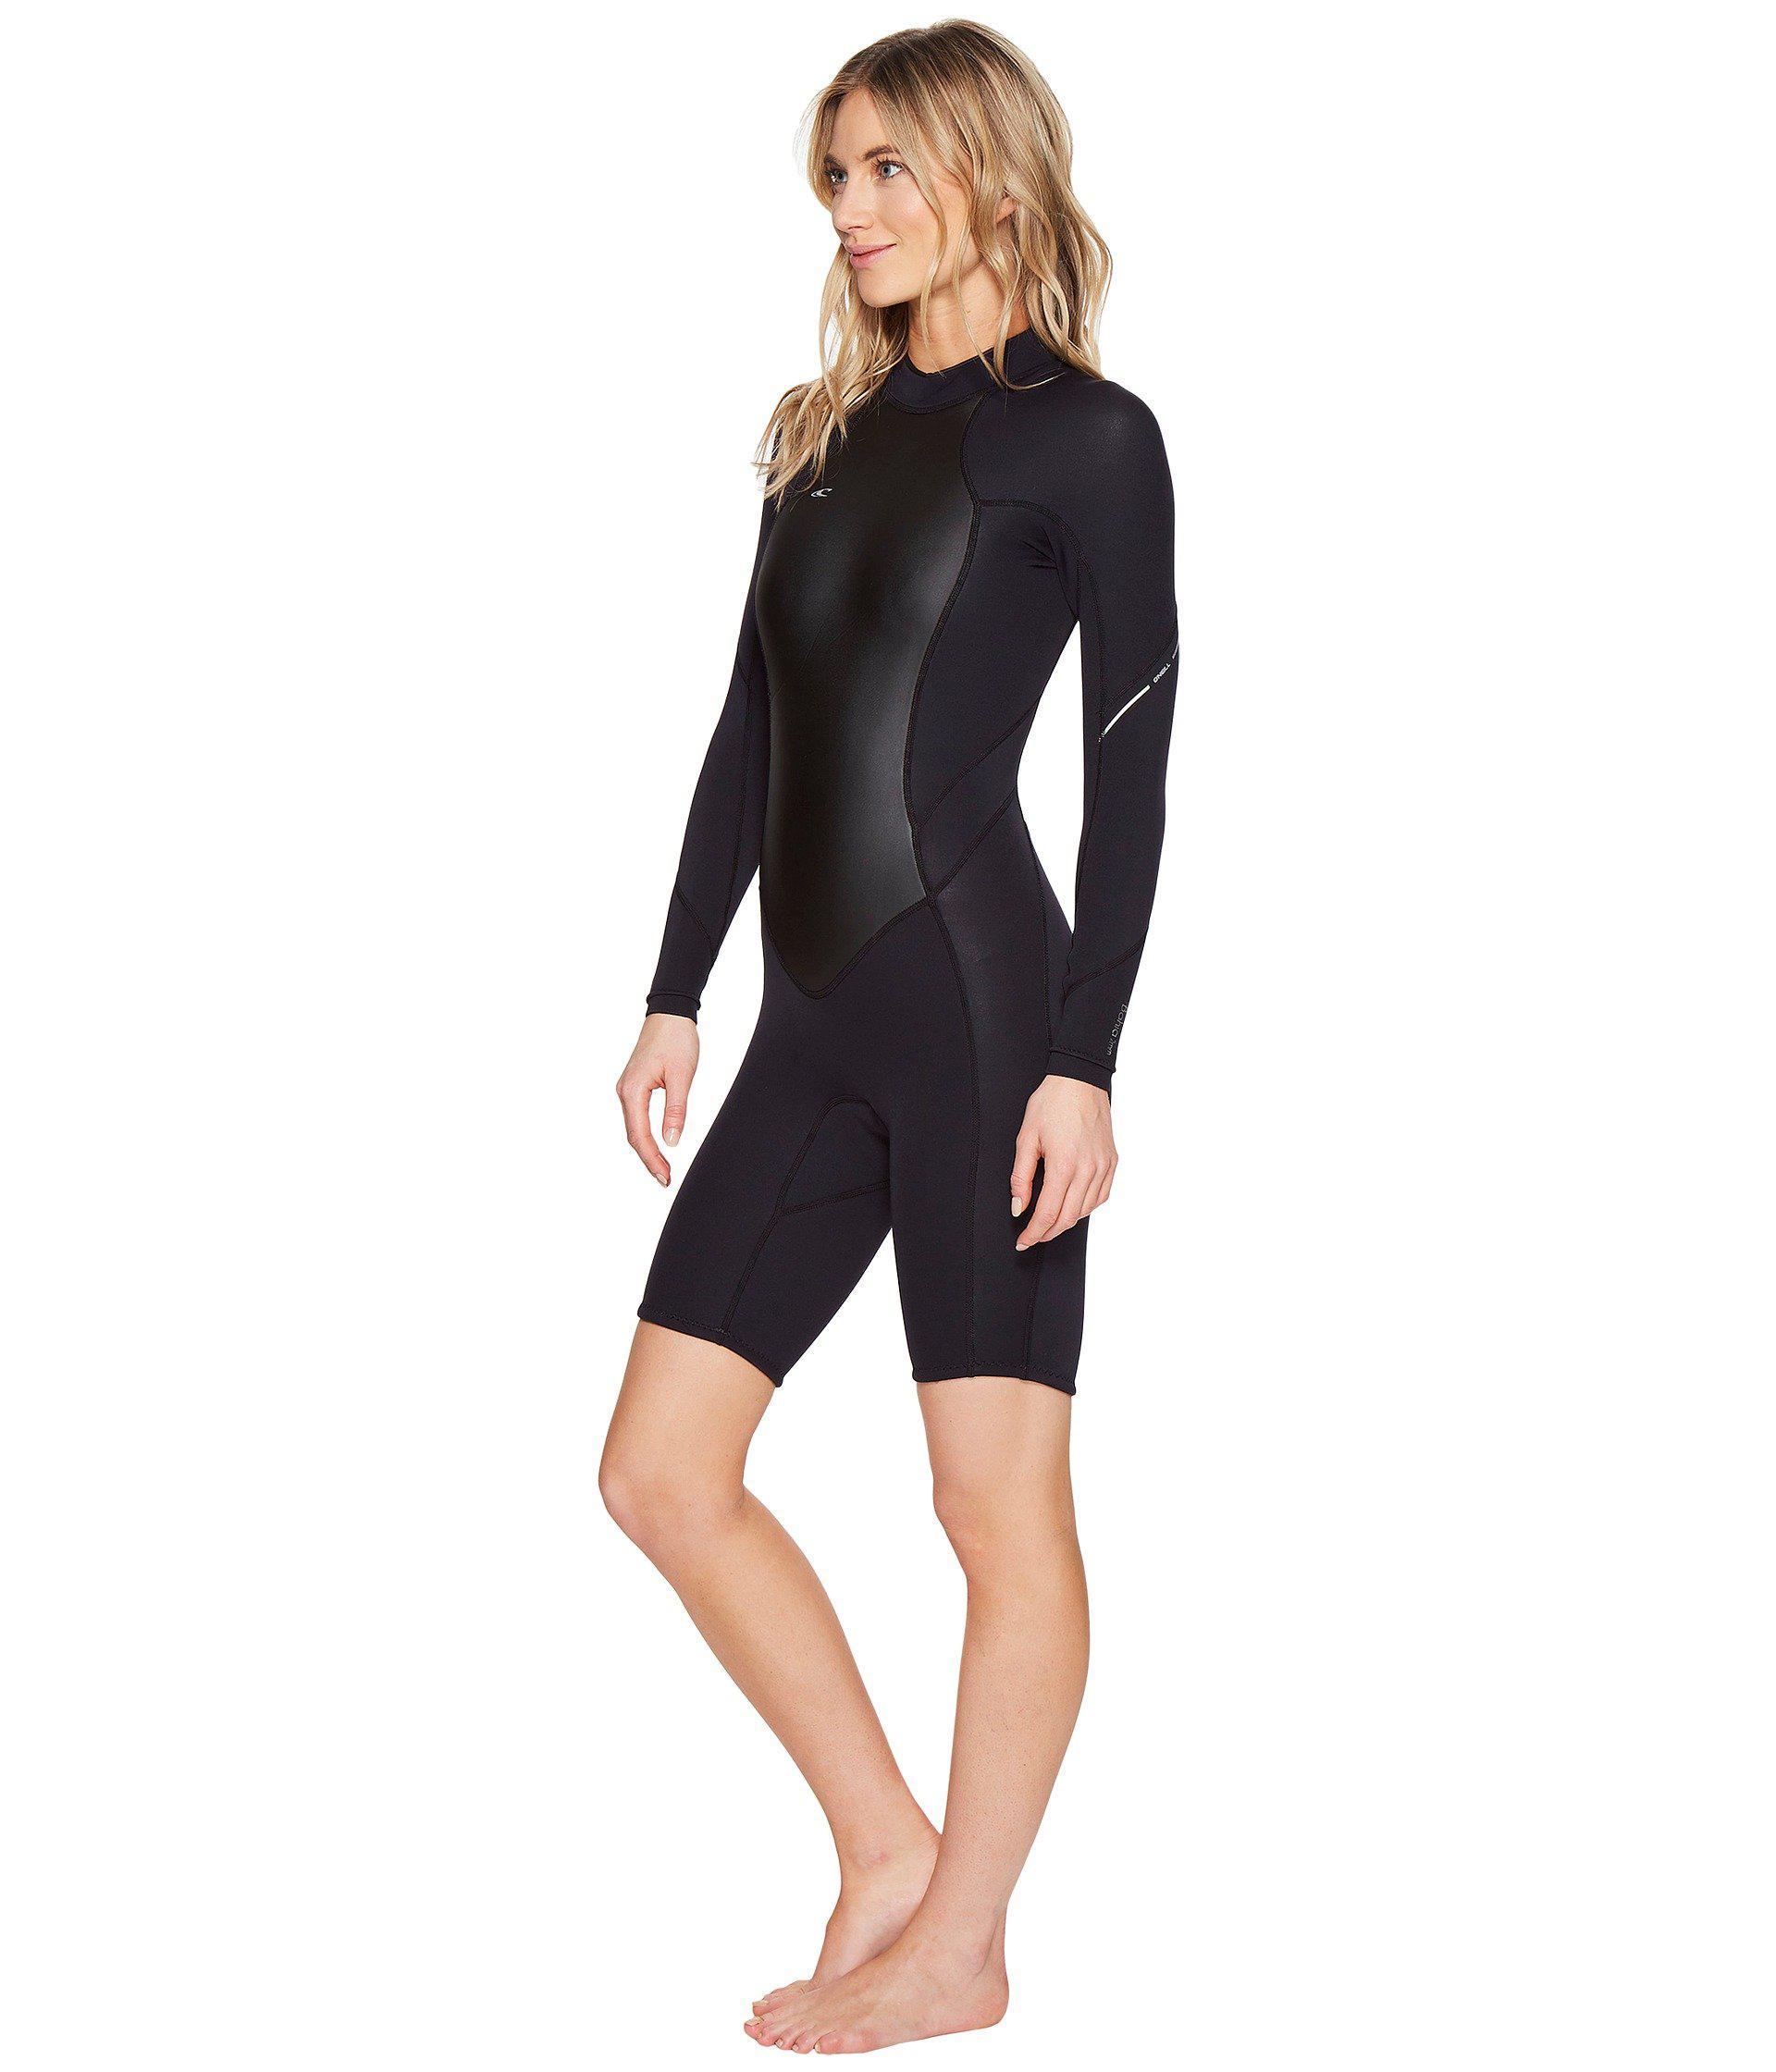 Lyst - O neill Sportswear Bahia Long Sleeve Spring (black black ... e73113919